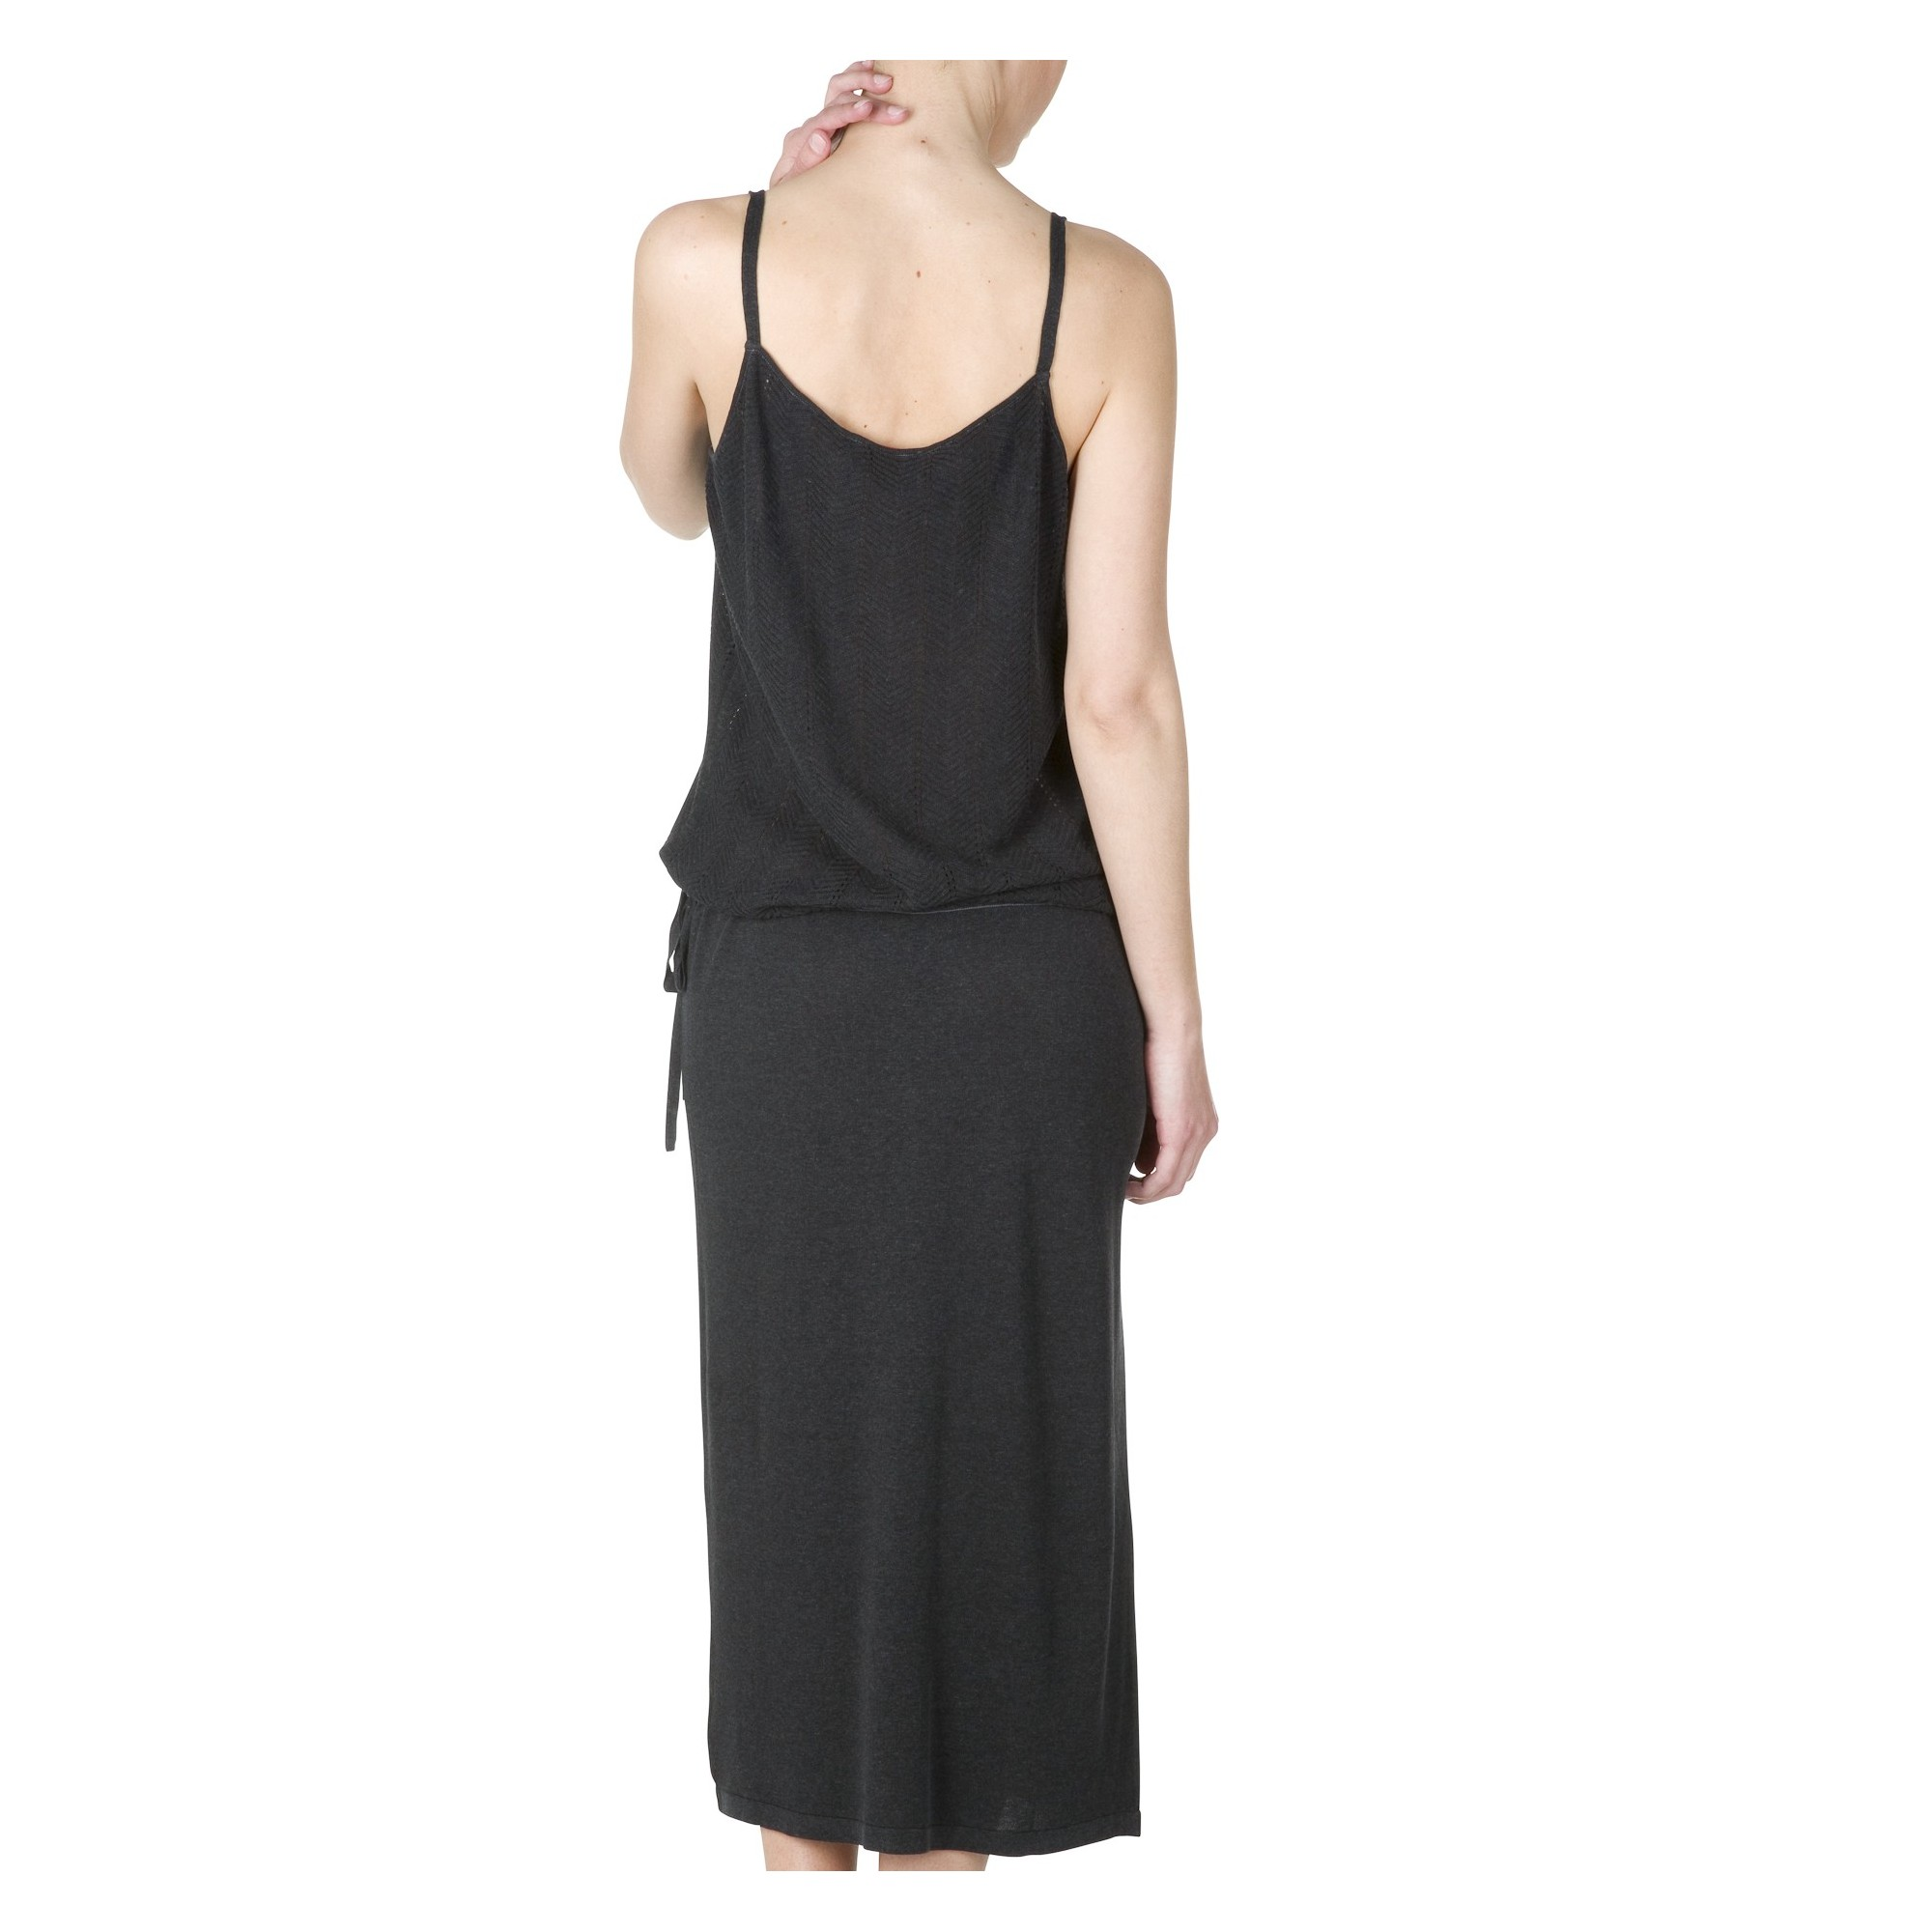 robe d 39 t soie et lin hasa. Black Bedroom Furniture Sets. Home Design Ideas